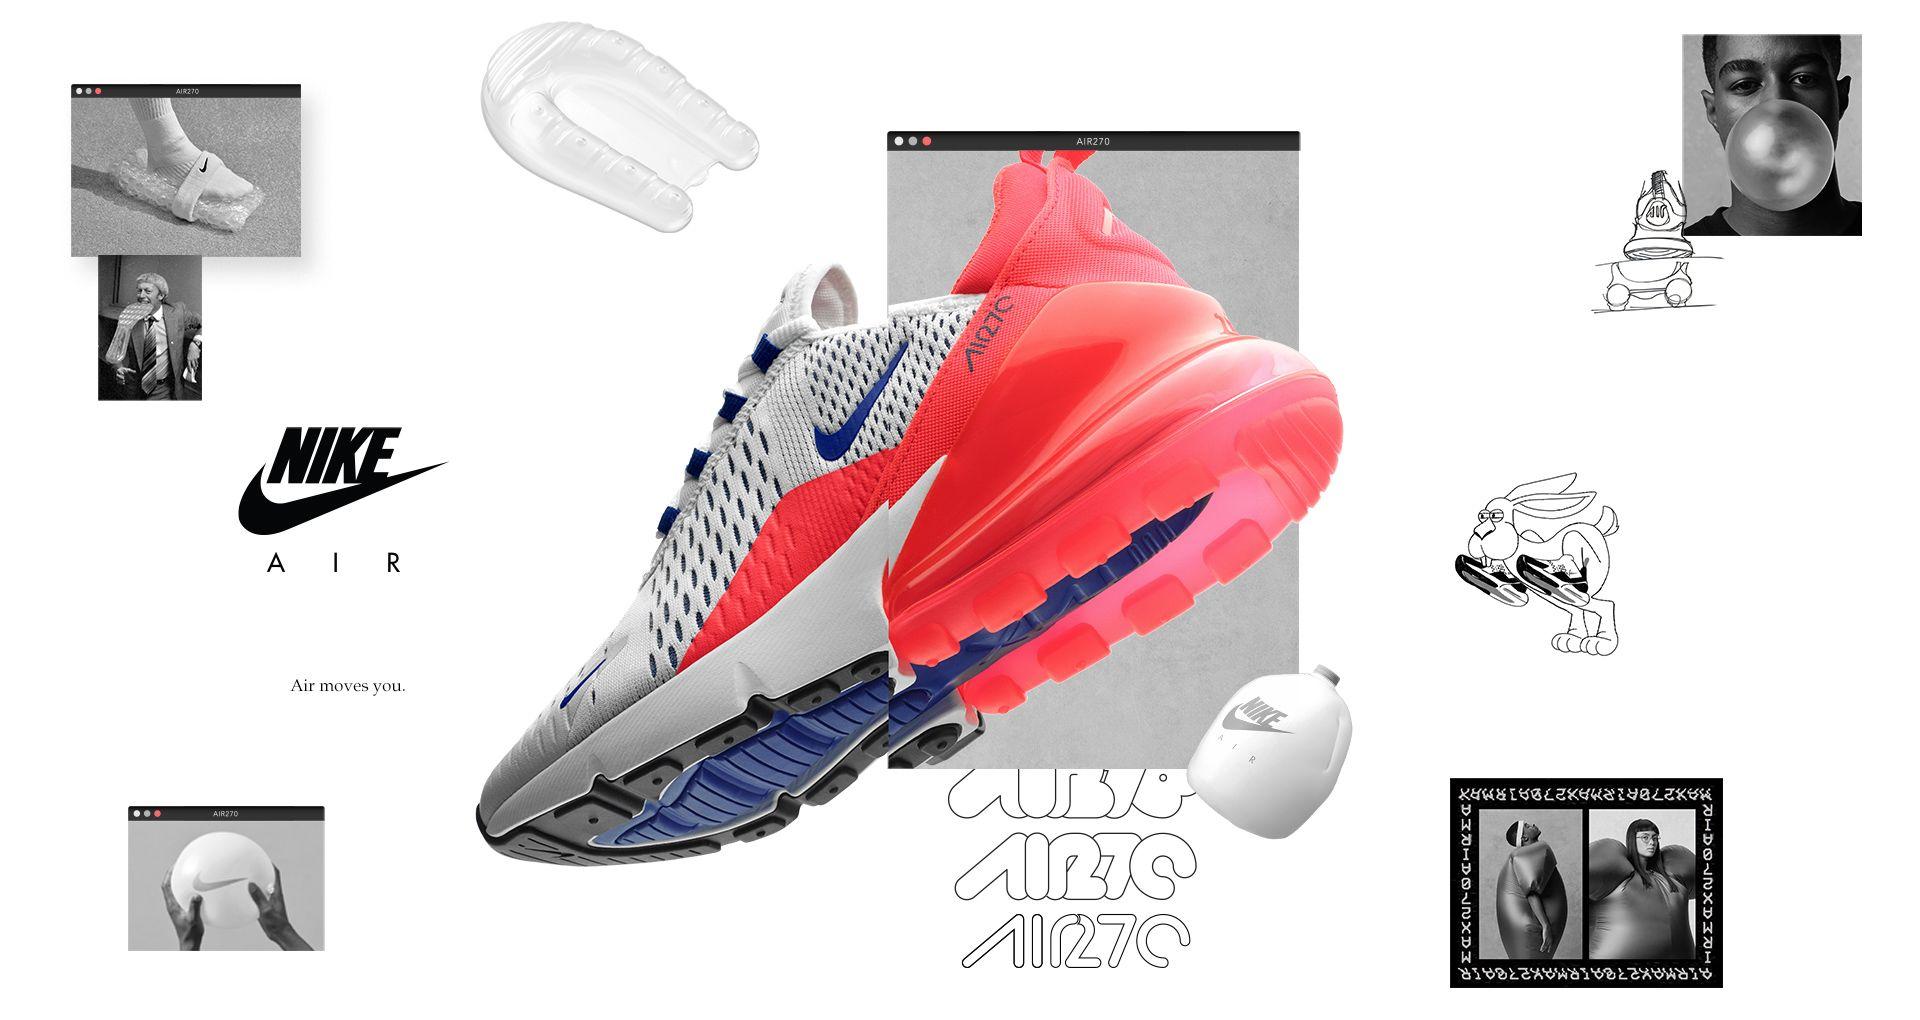 Nike Air Max 270 UltramarineSolar Red For Women